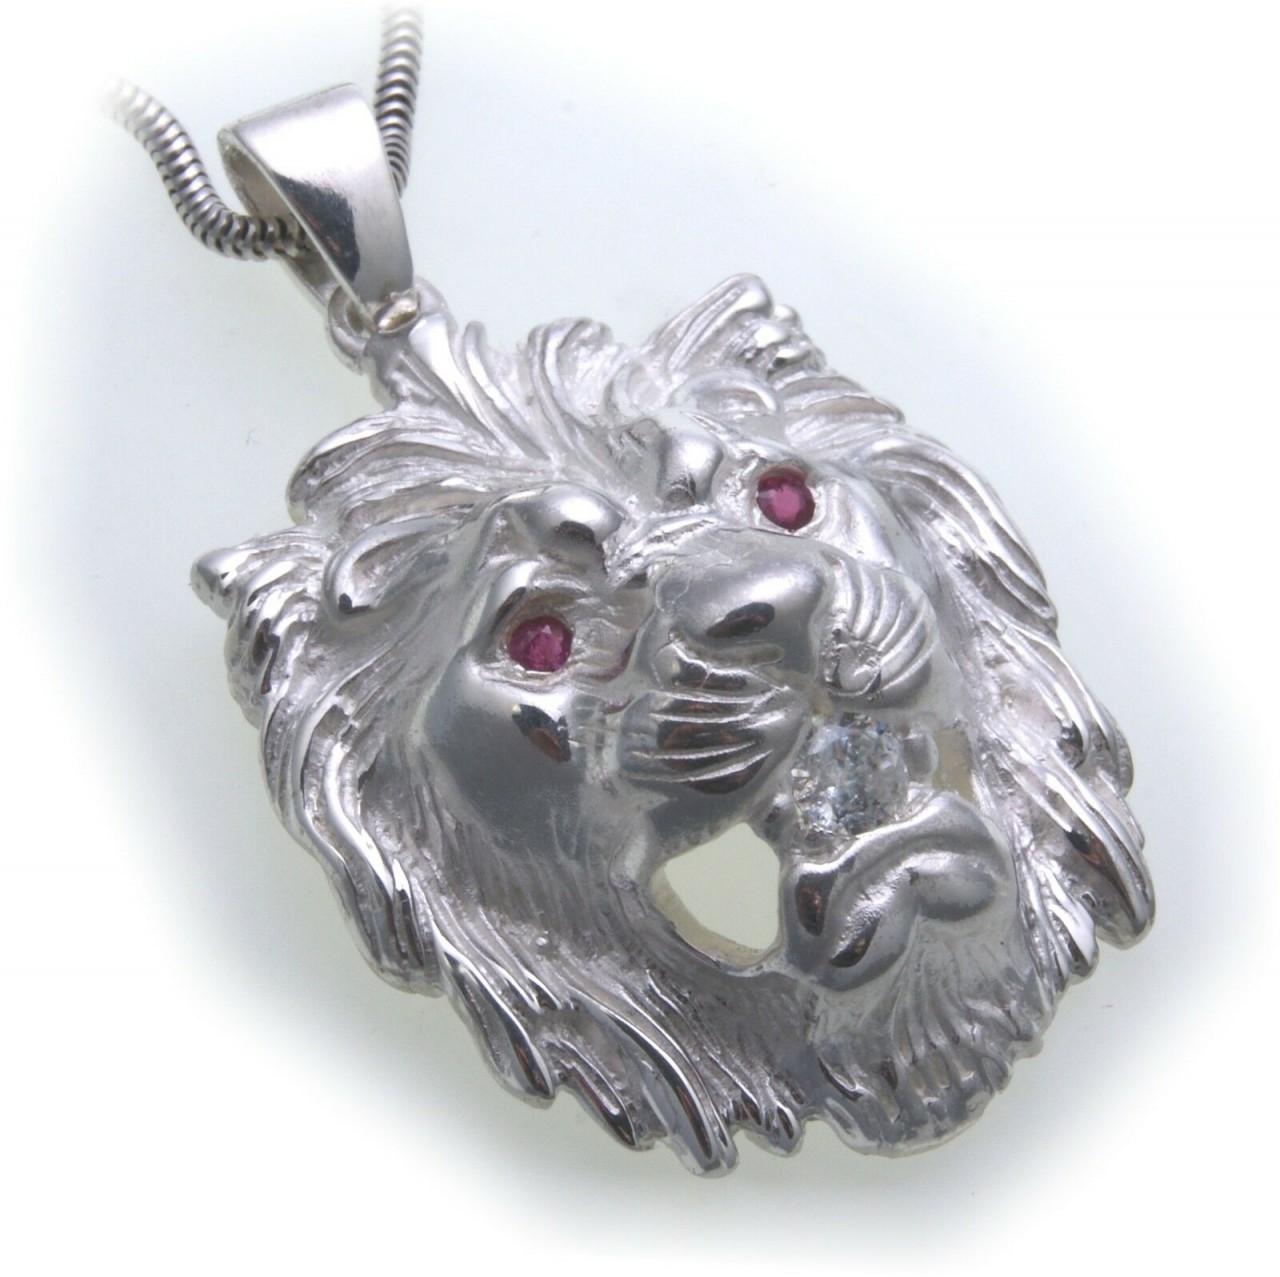 Anhänger Löwe Kopf echt Silber 925 Rubin Zirkonia Raubkatze Sterlingsilber Neu